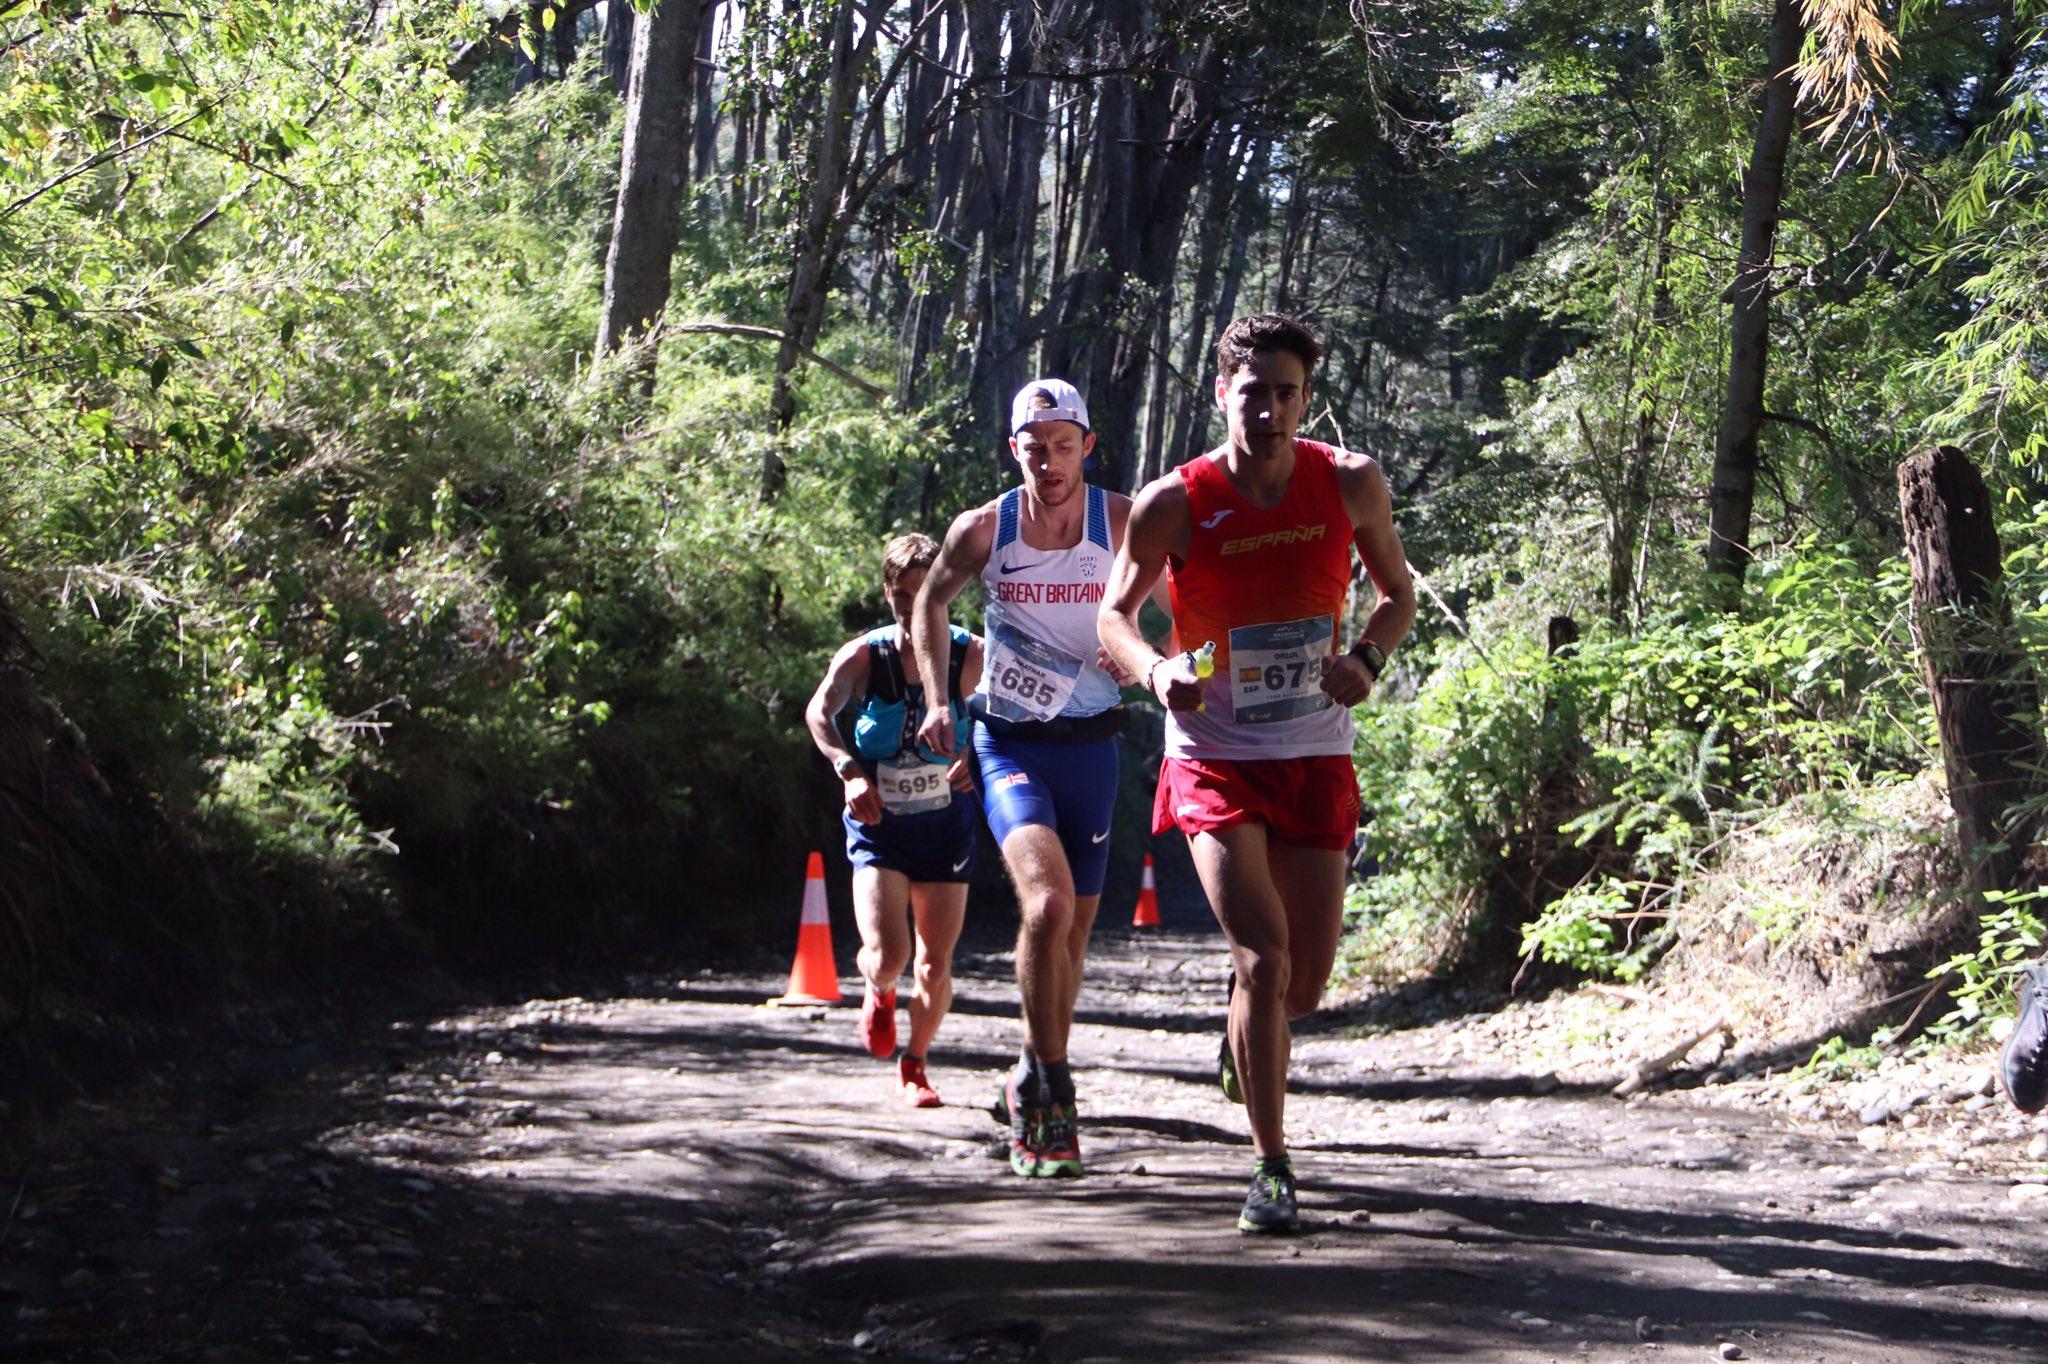 Oriol Cardona Mundial de trail running de Villa La Angostura